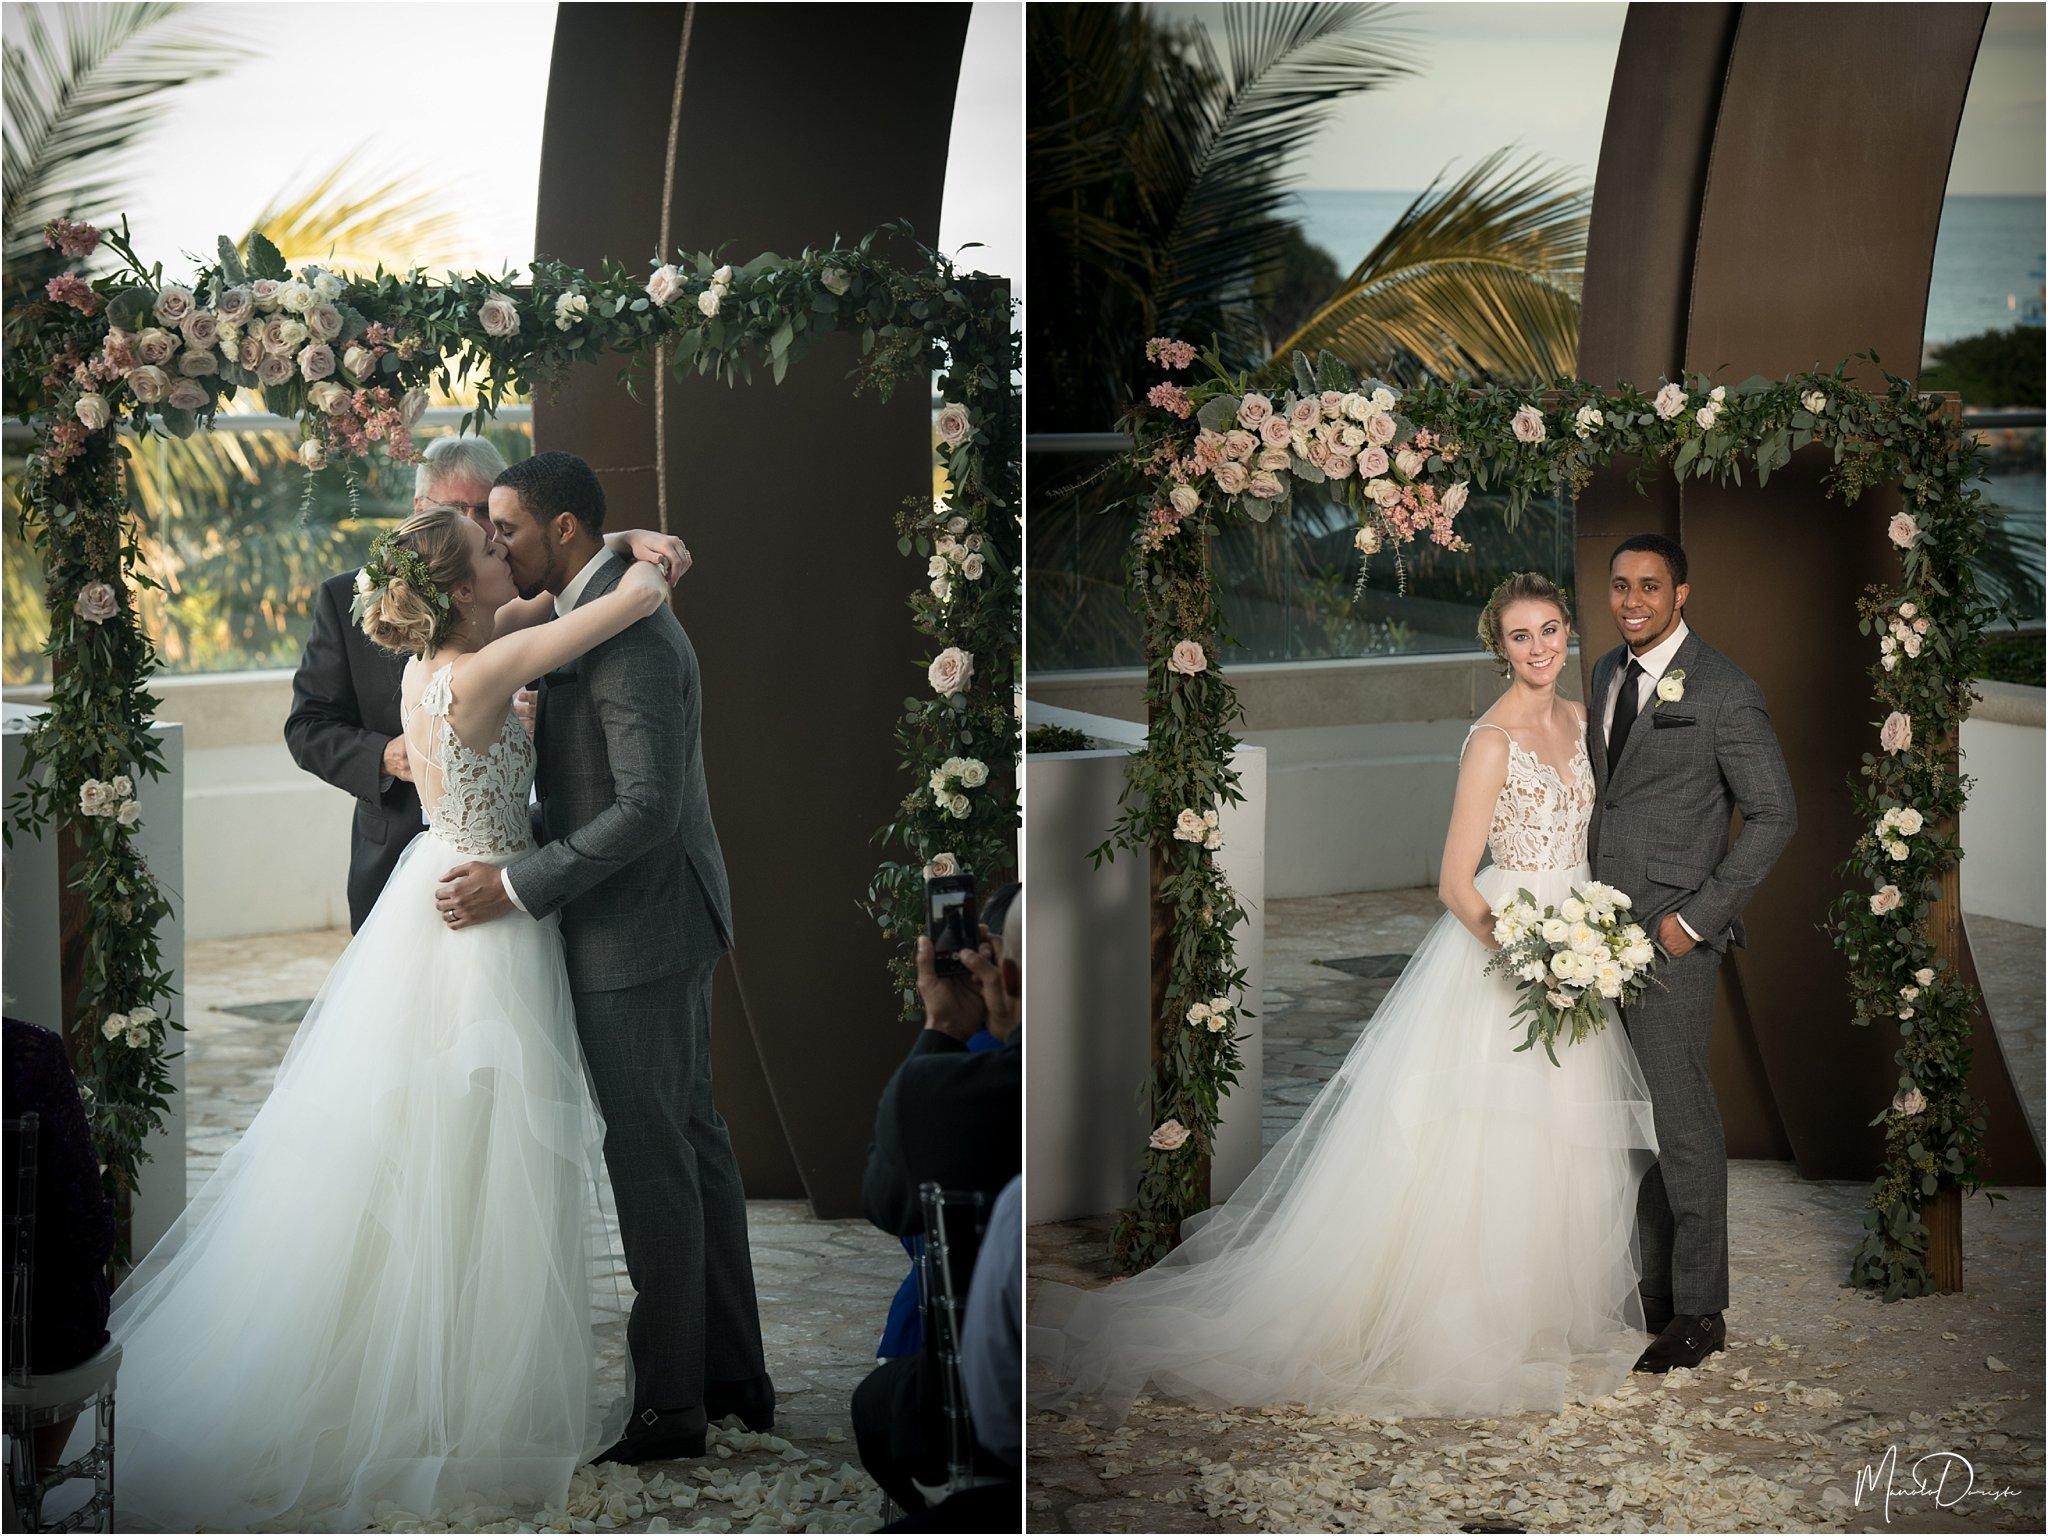 00885_ManoloDoreste_InFocusStudios_Wedding_Family_Photography_Miami_MiamiPhotographer.jpg